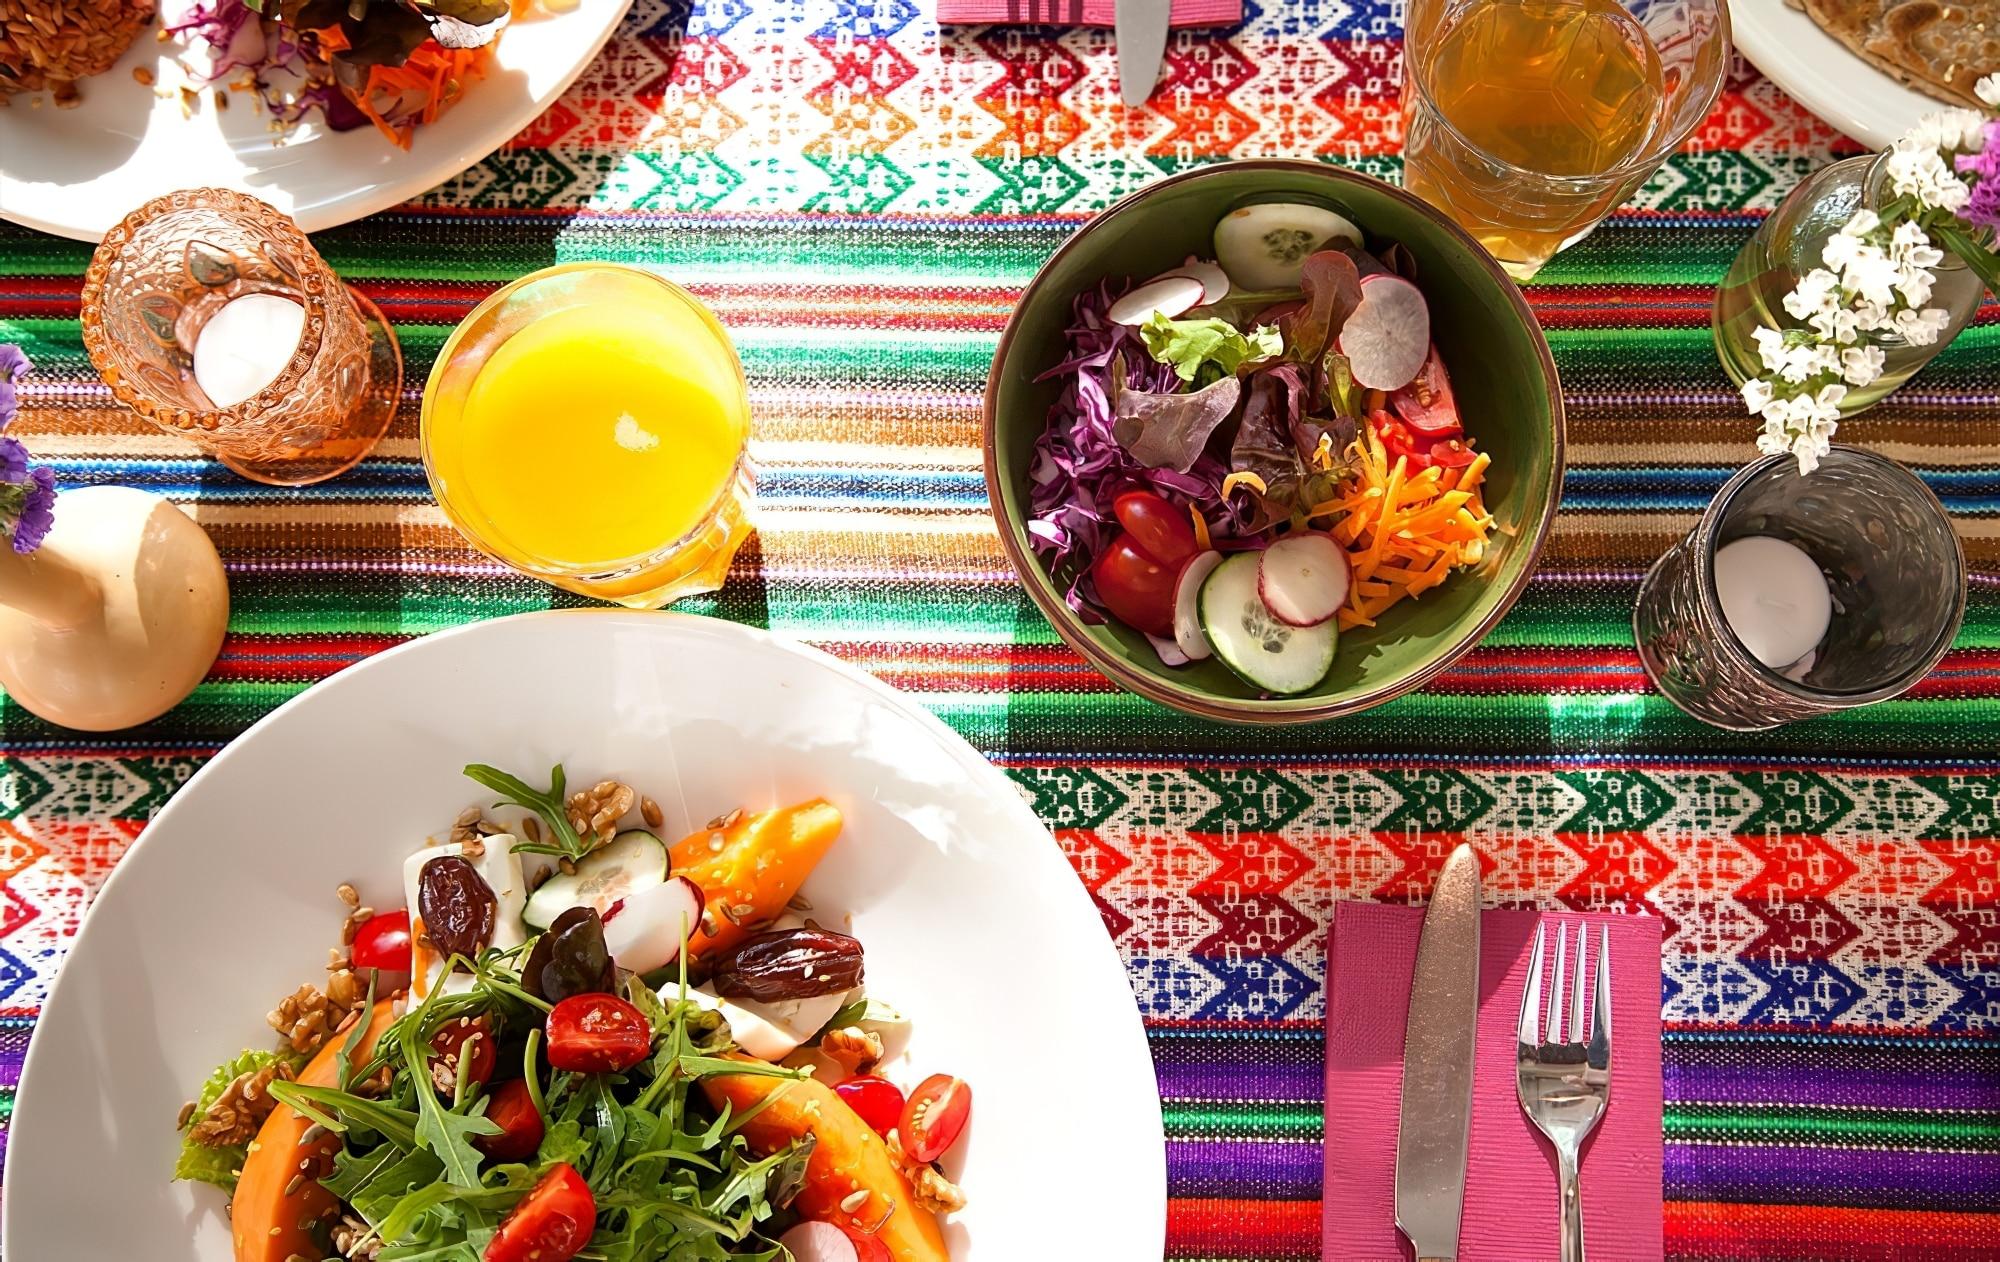 Restaurant vegan de Lisbonne